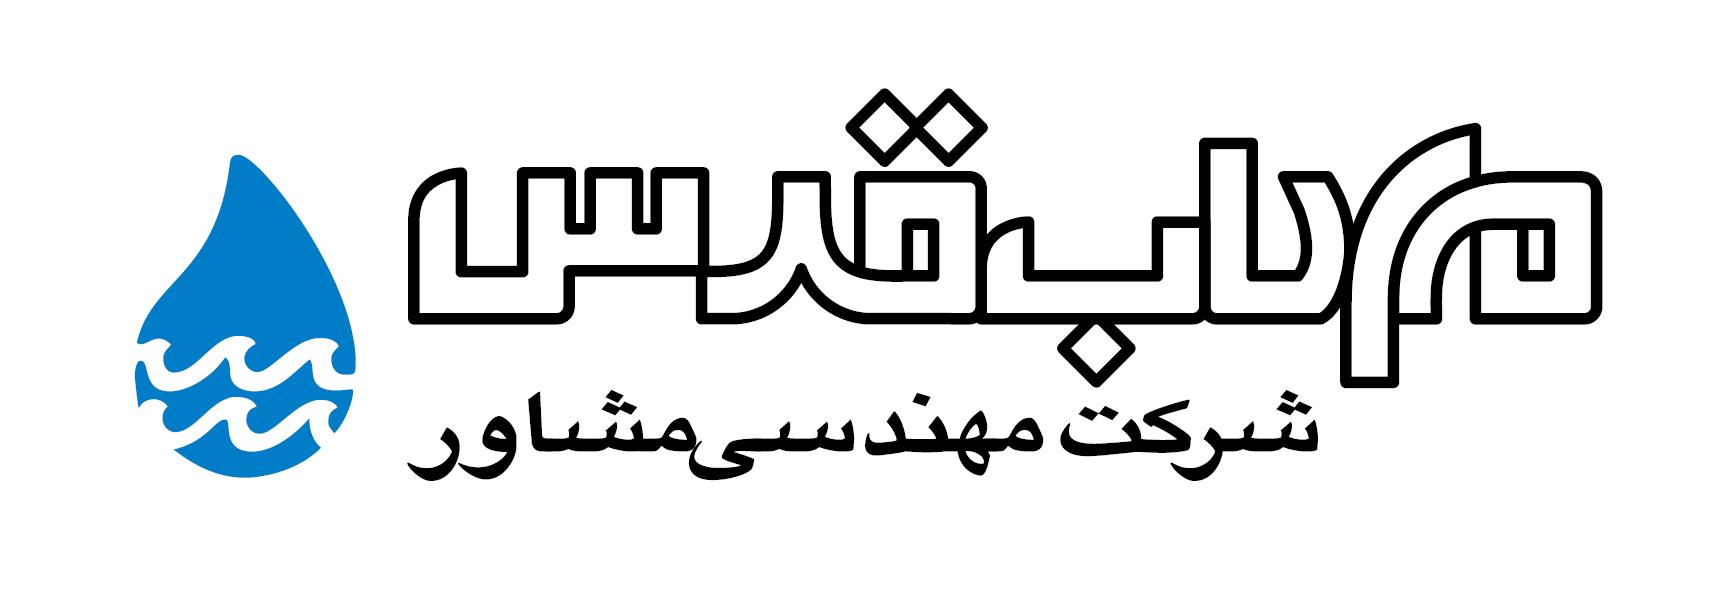 مهاب قدس